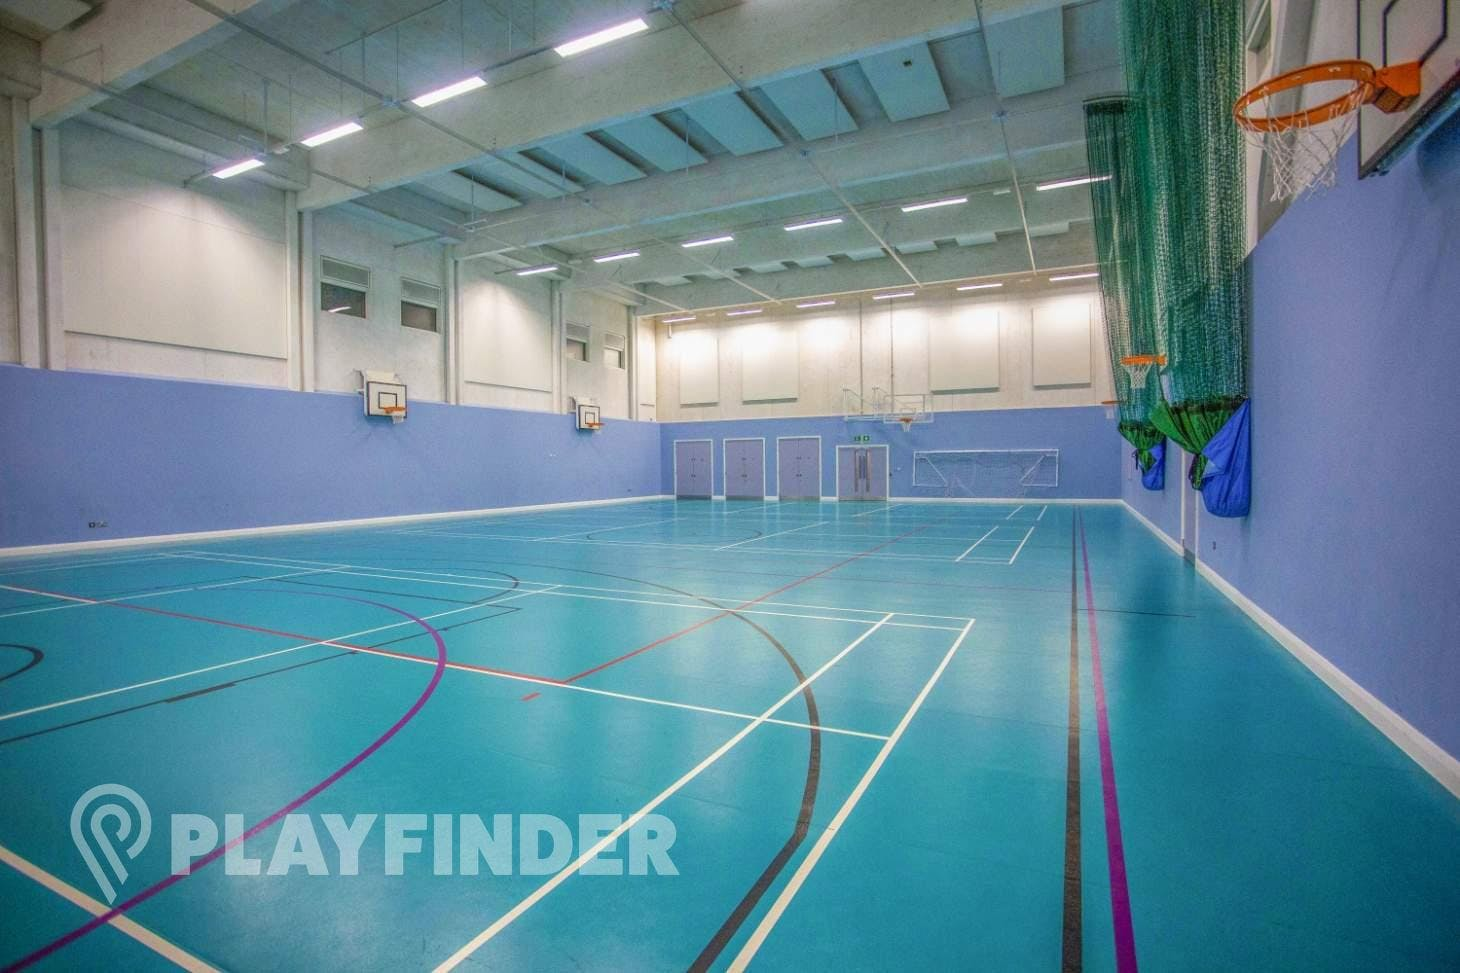 Mossbourne Victoria Park Academy Indoor basketball court